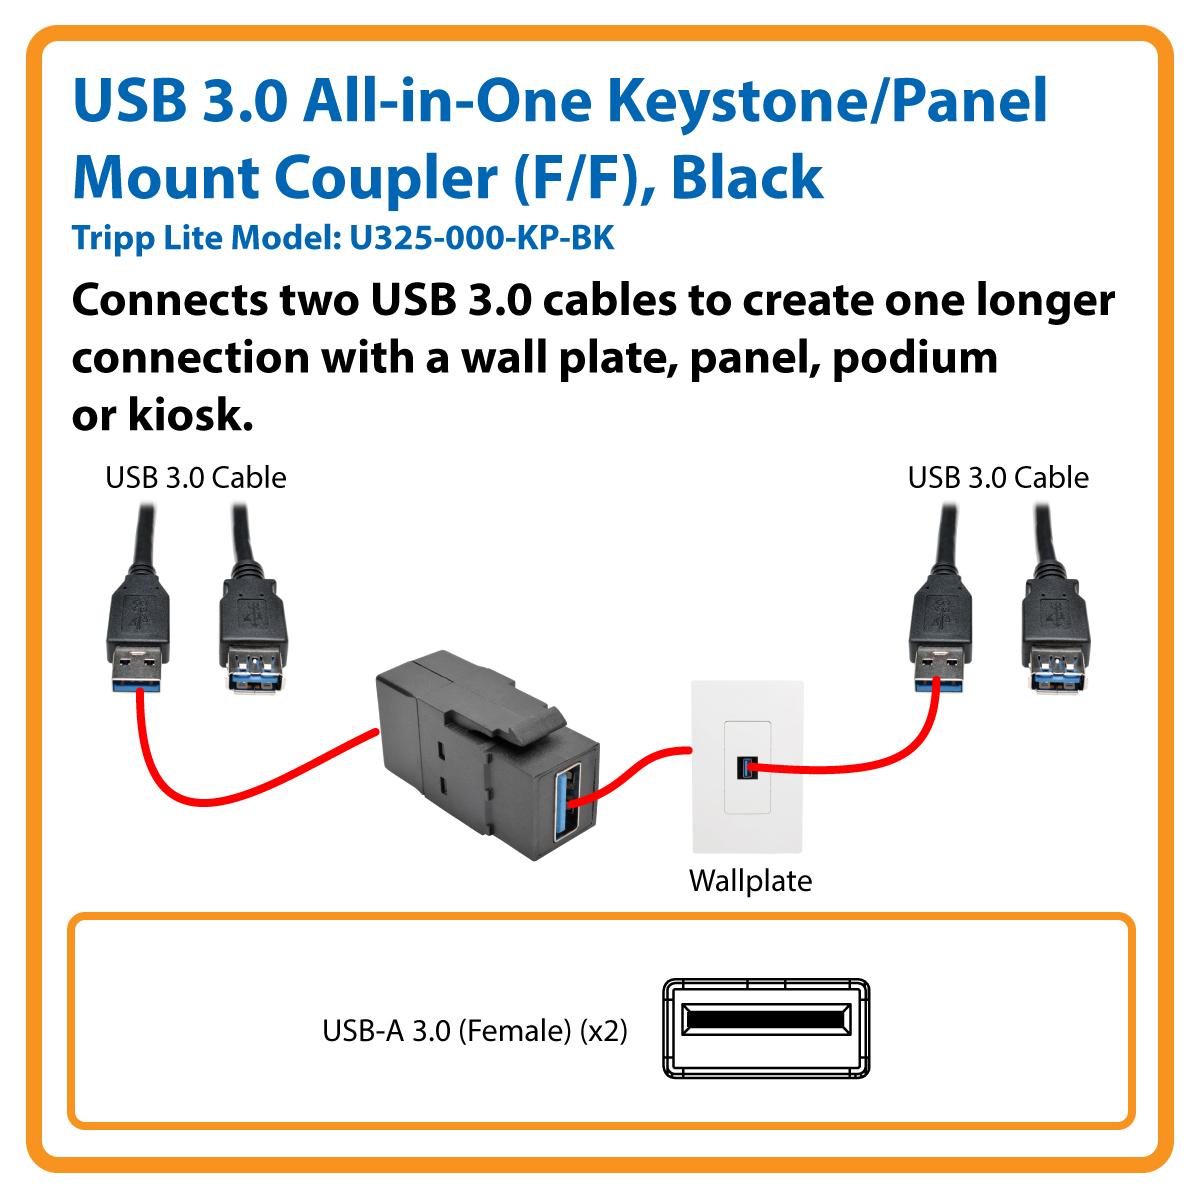 Tripp Lite Usb 30 Keystone Panel Mount Coupler F All In One Black Scsi To Wiring Diagram